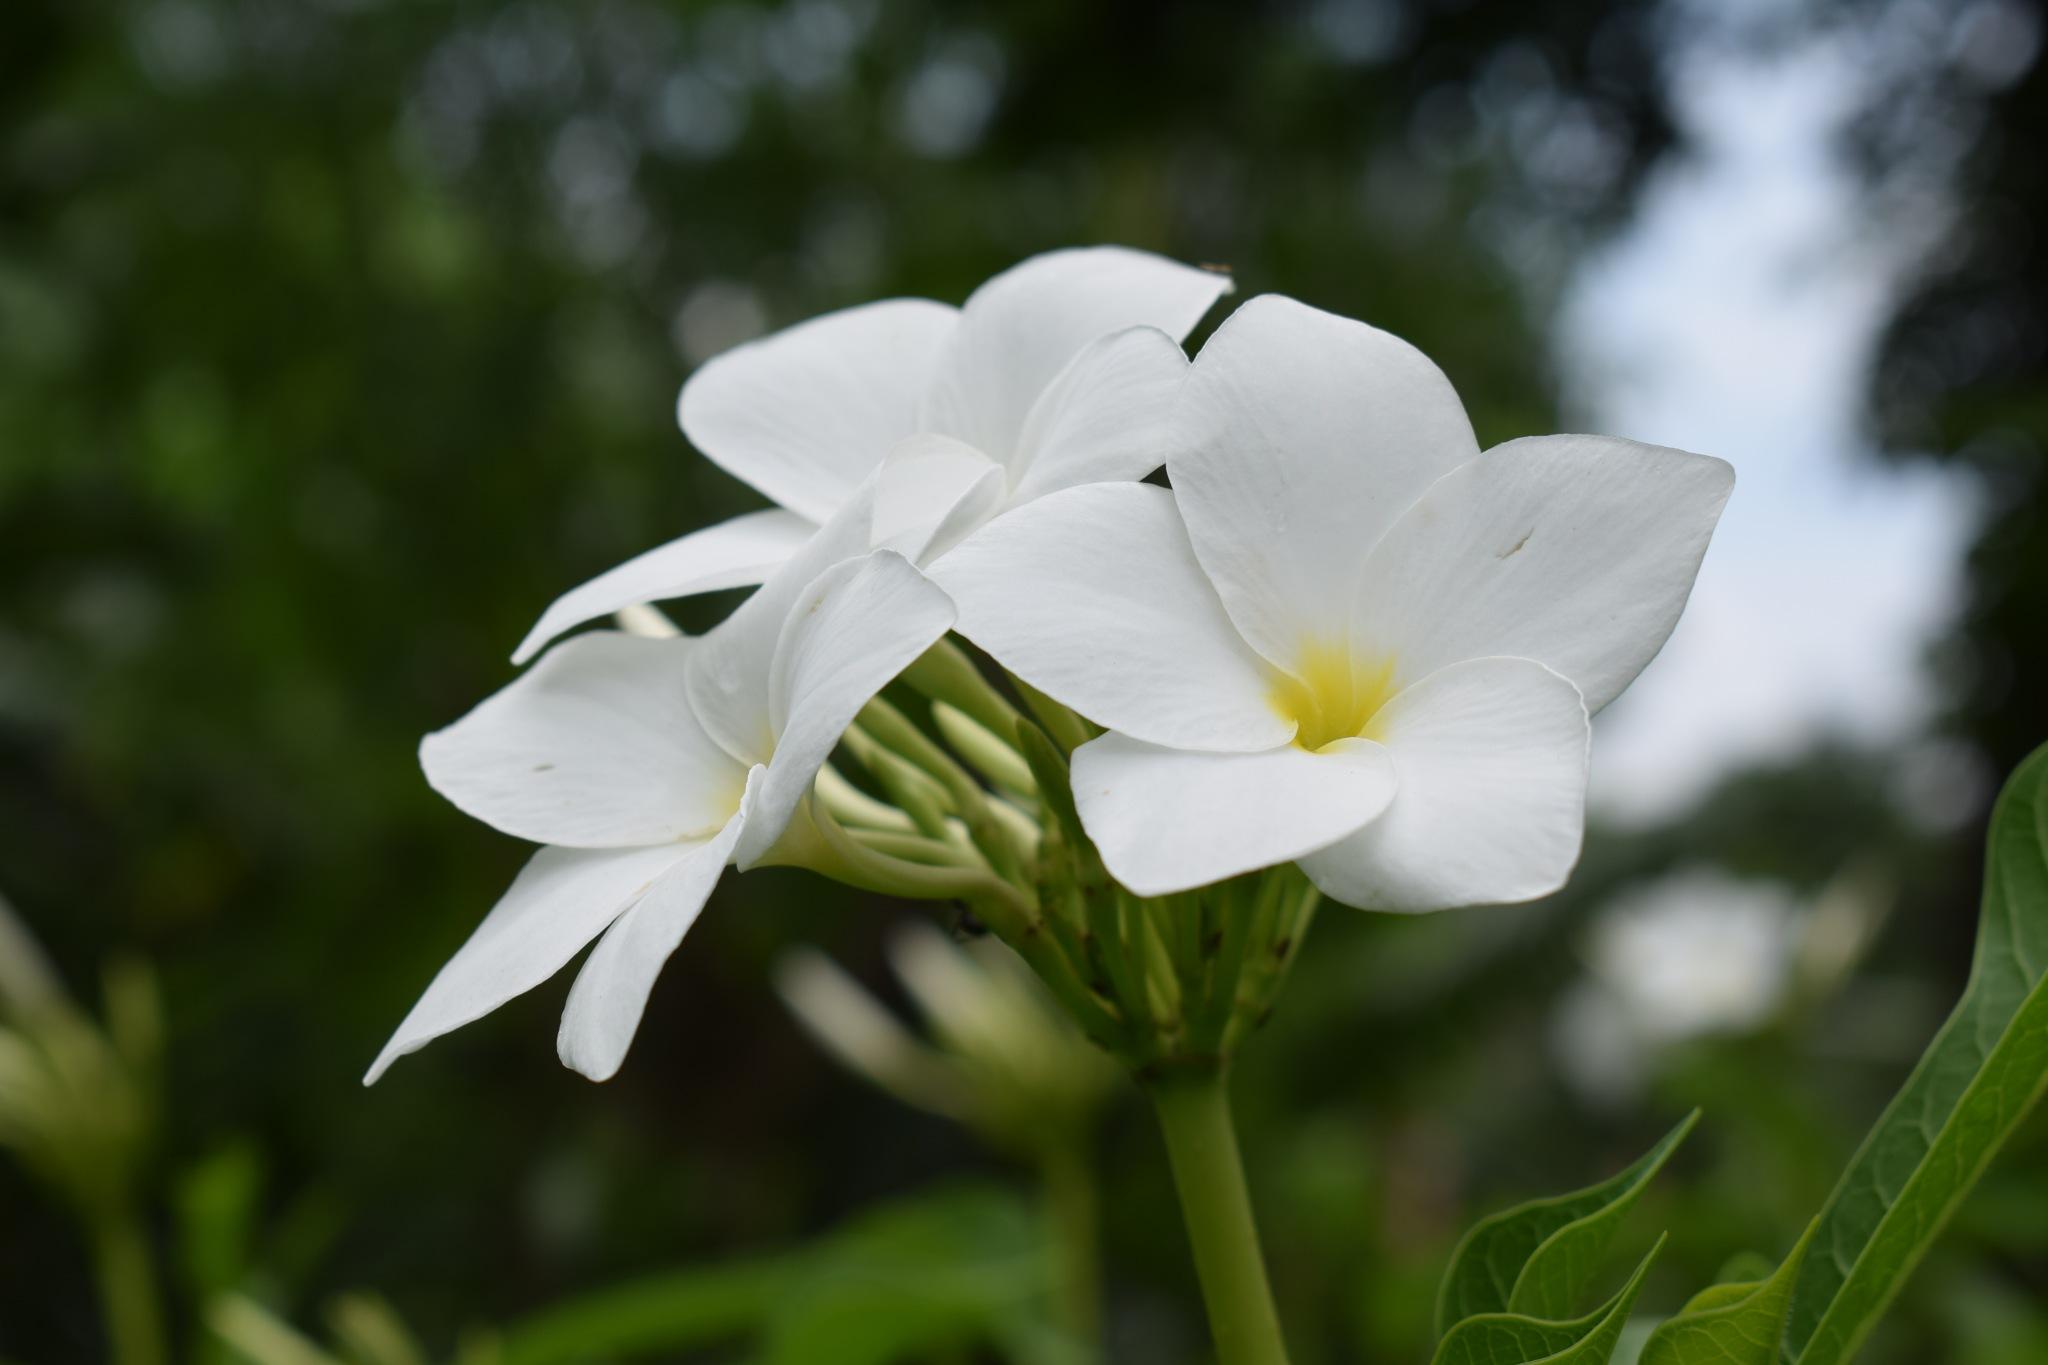 Flower of Bangladesh  by Mohammad Monir Hossain